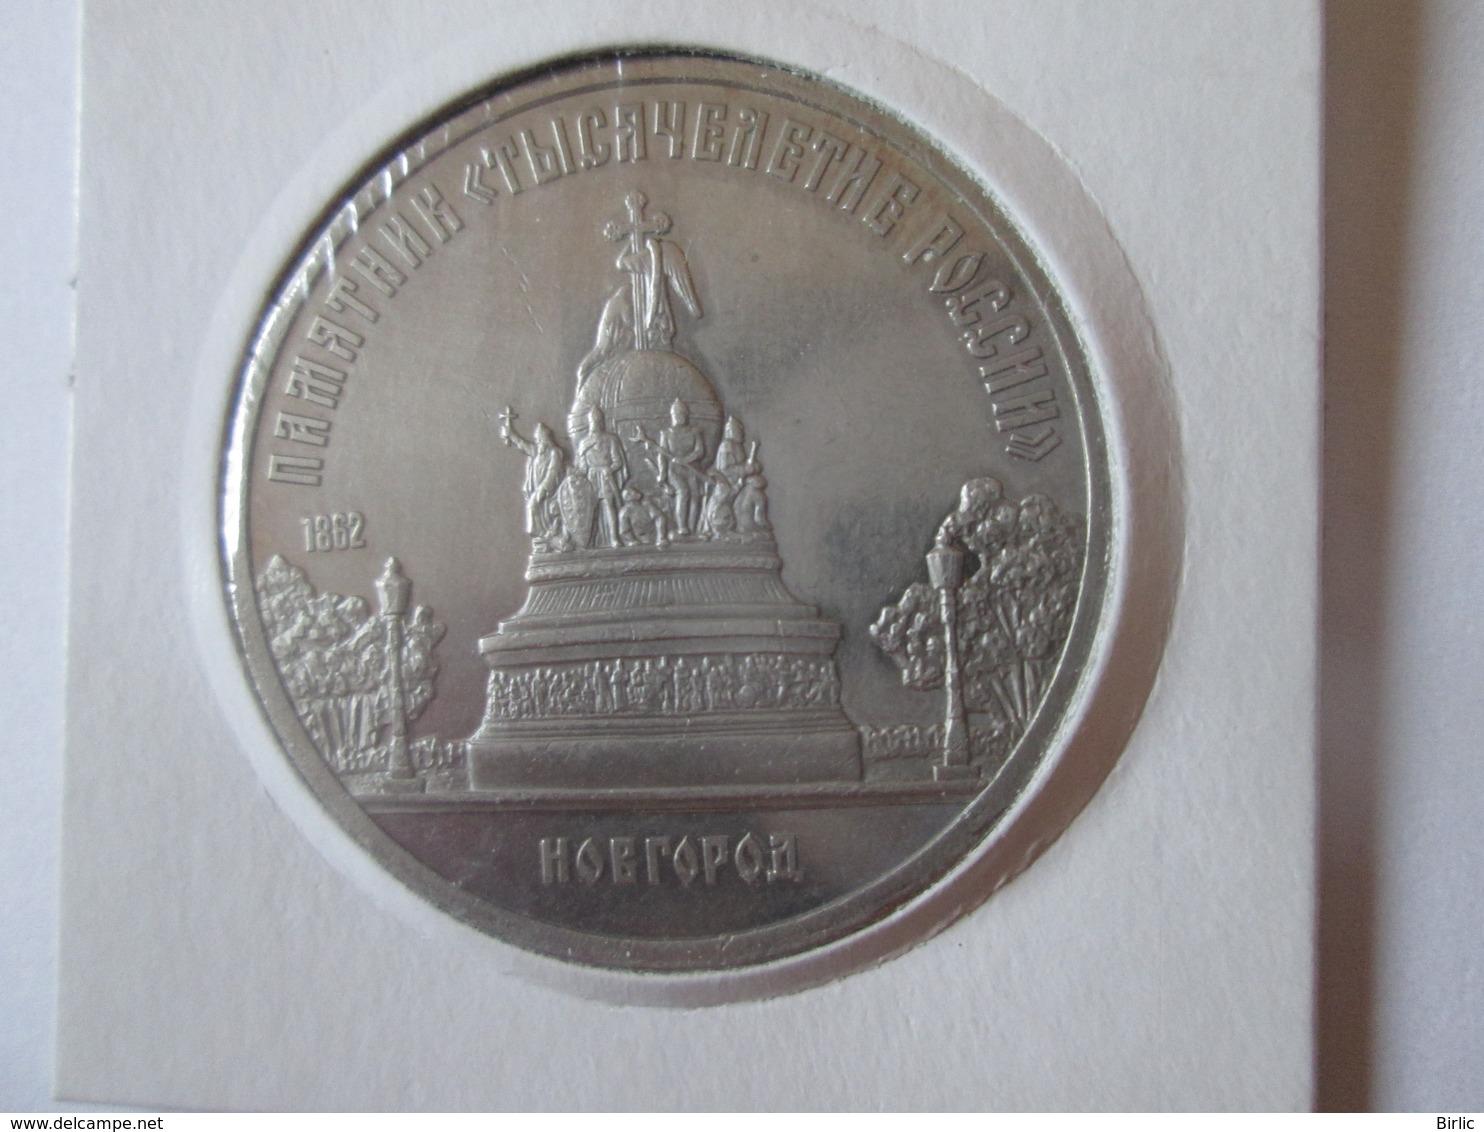 USSR/Russia 5 Rubles 1988 Proof Coin-Novgorod - Rusland